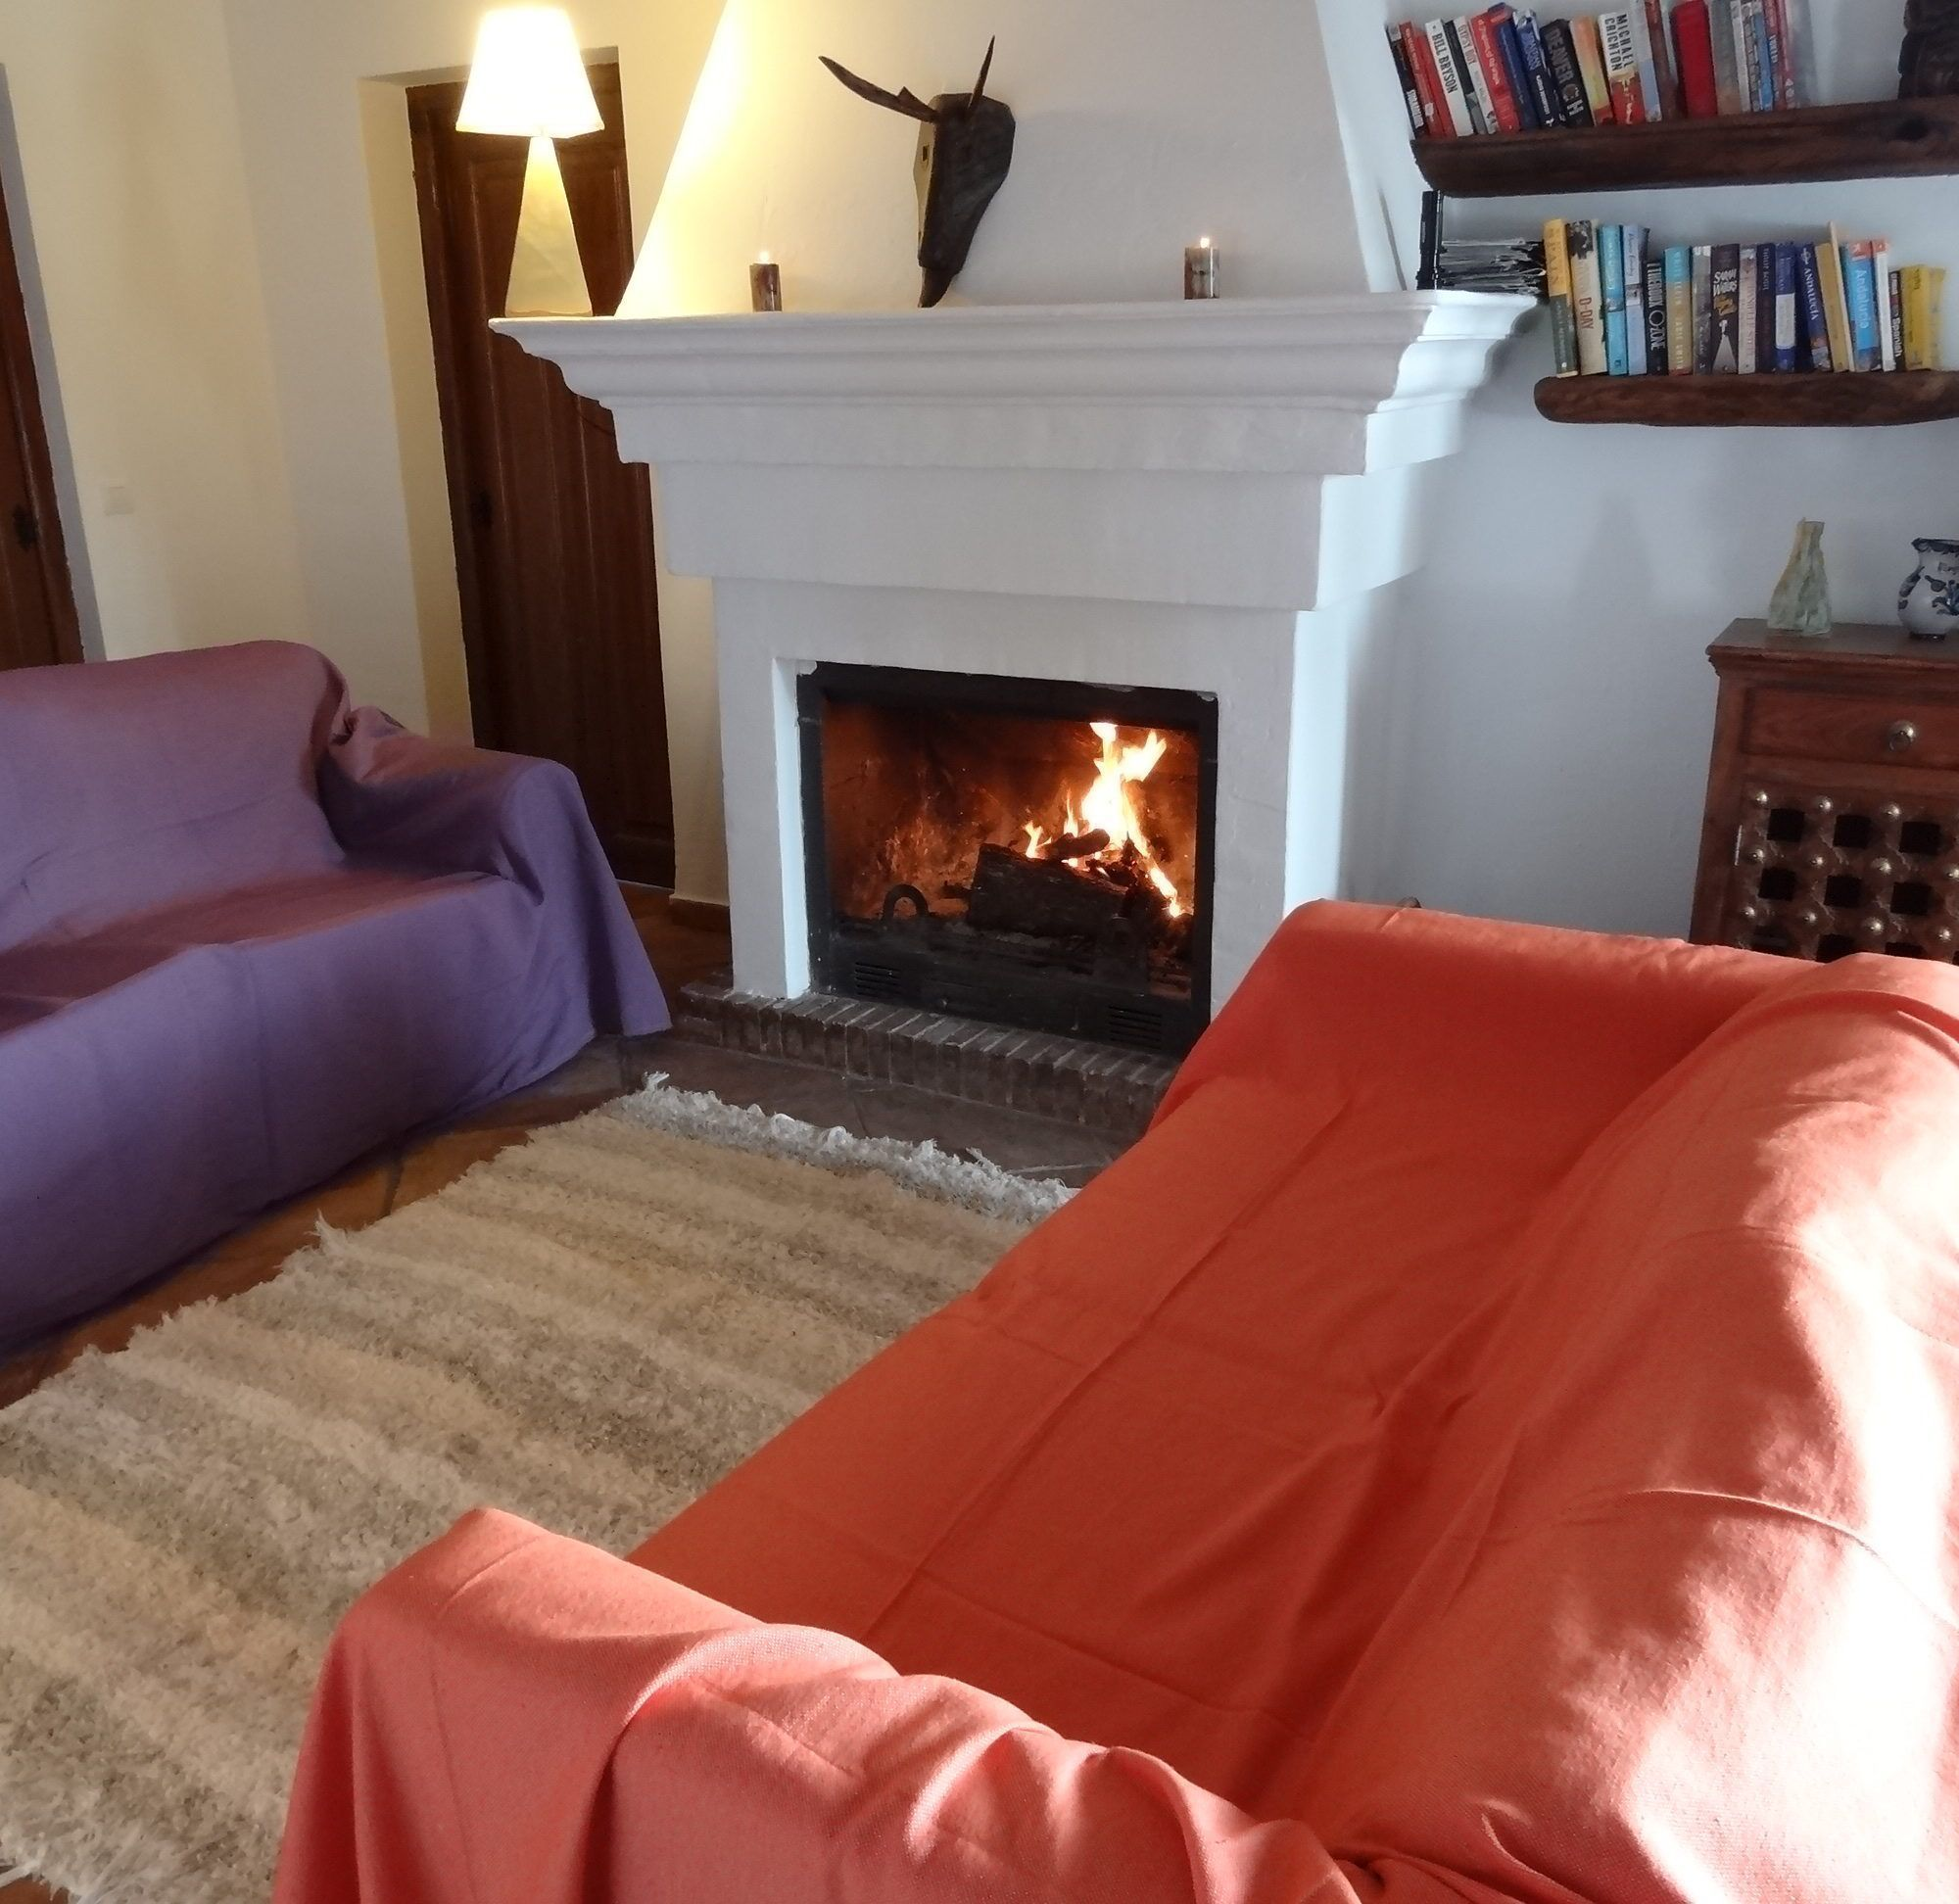 Cubre sof azul jarapa hilacar artesanos alpujarra bubi n - Jarapas para sofas ...